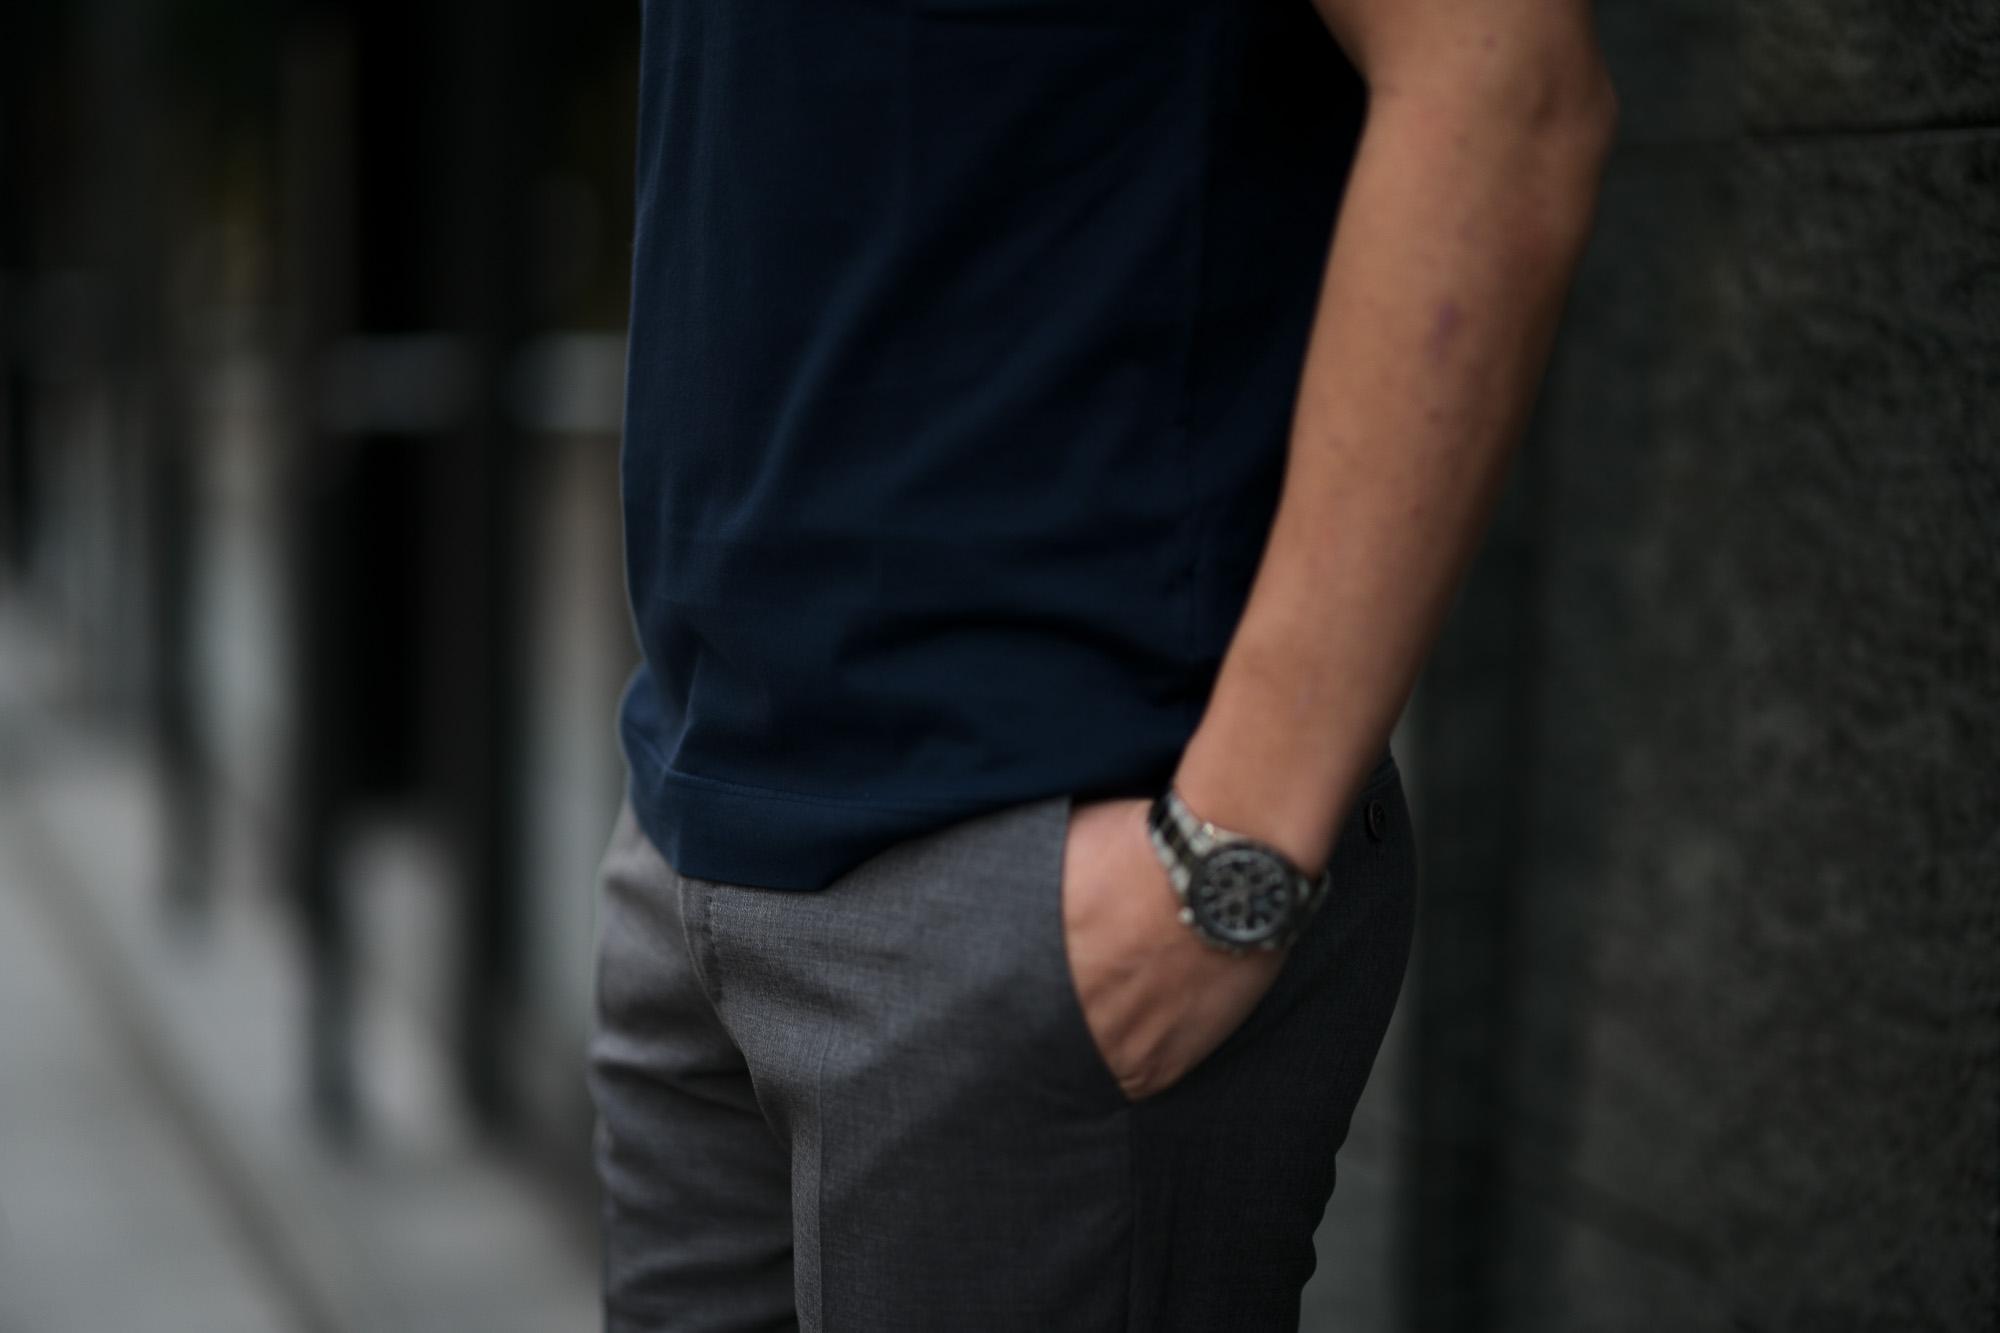 FEDELI(フェデーリ) Crew Neck T-shirt (クルーネック Tシャツ) ギザコットン Tシャツ NAVY (ネイビー・626) made in italy (イタリア製) 2020 春夏 【ご予約受付中】愛知 名古屋 altoediritto アルトエデリット TEE